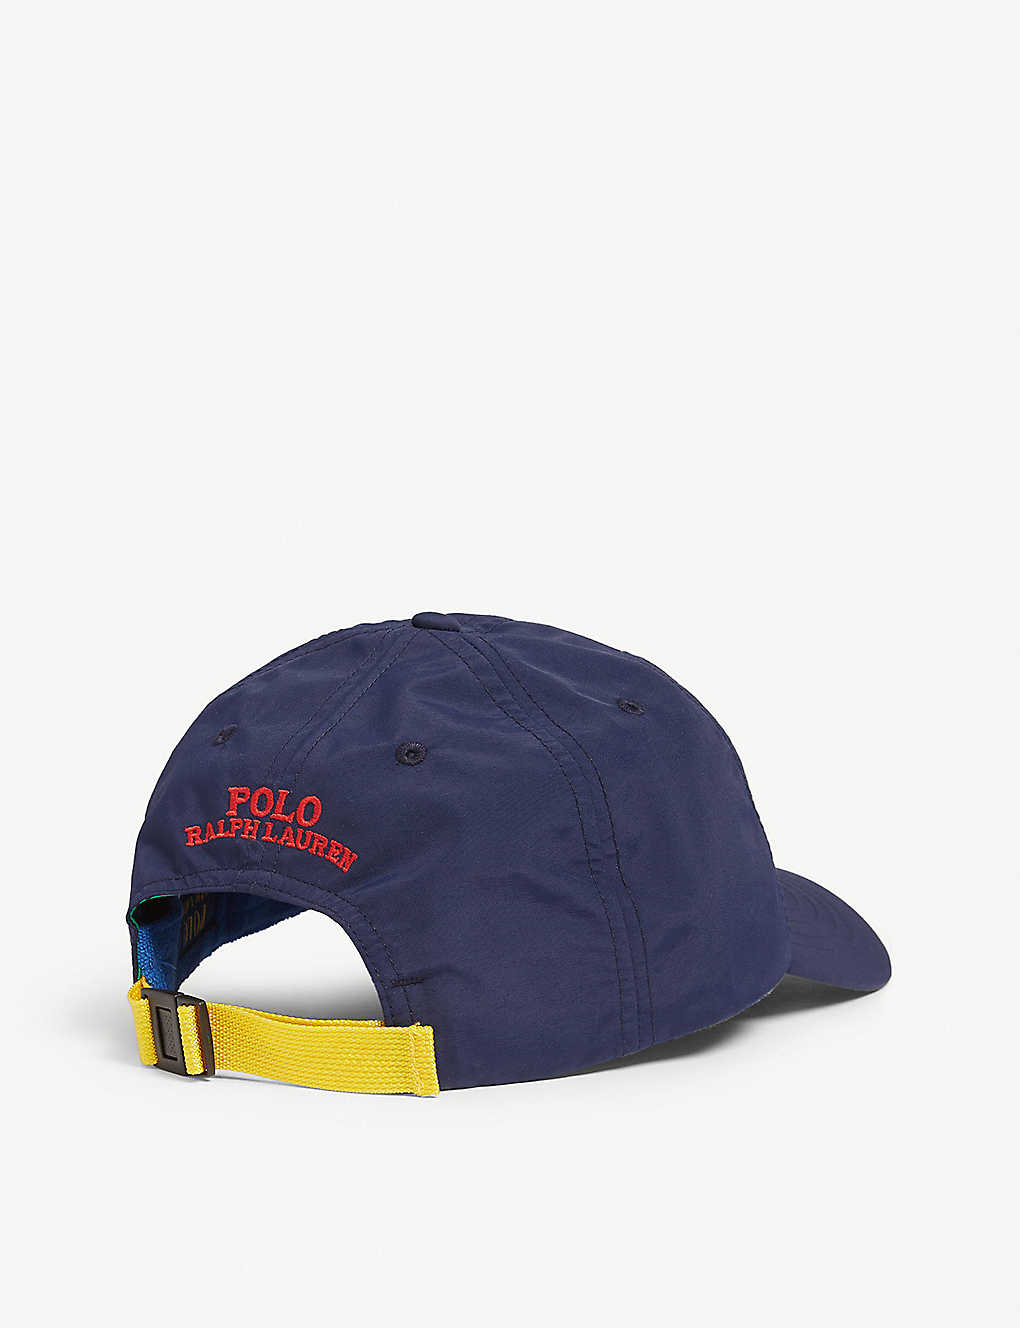 b3bc0f52ebc06 ... Logo-appliquéd woven baseball cap - Newport navy zoom